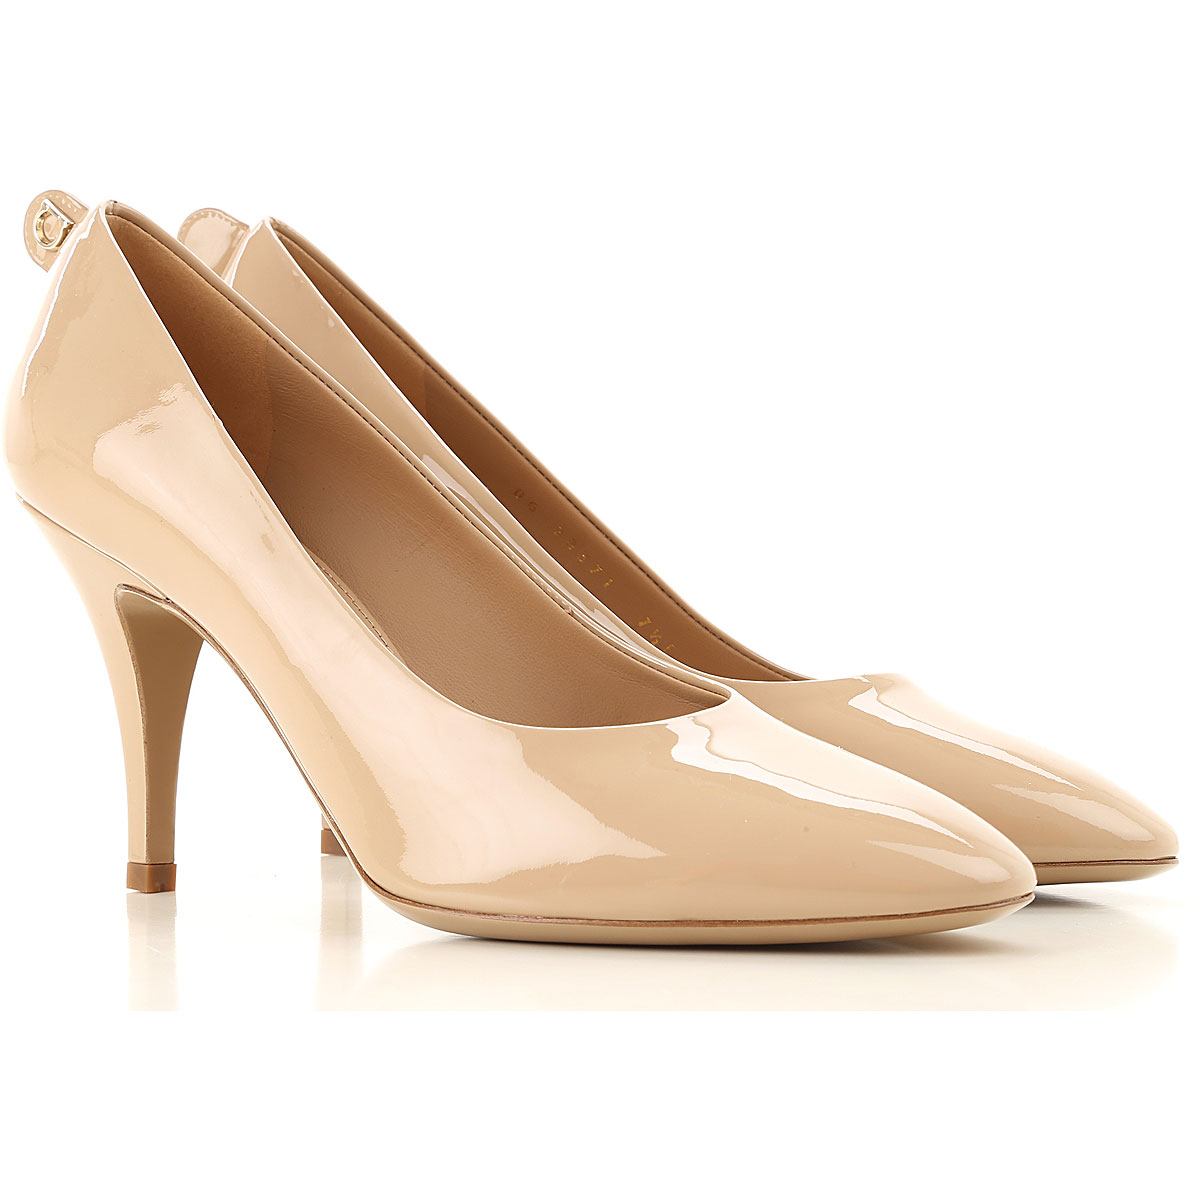 Salvatore Ferragamo Pumps & High Heels for Women On Sale, Almond, Patent Leather, 2019, 5.5 6.5 8.5 9.5